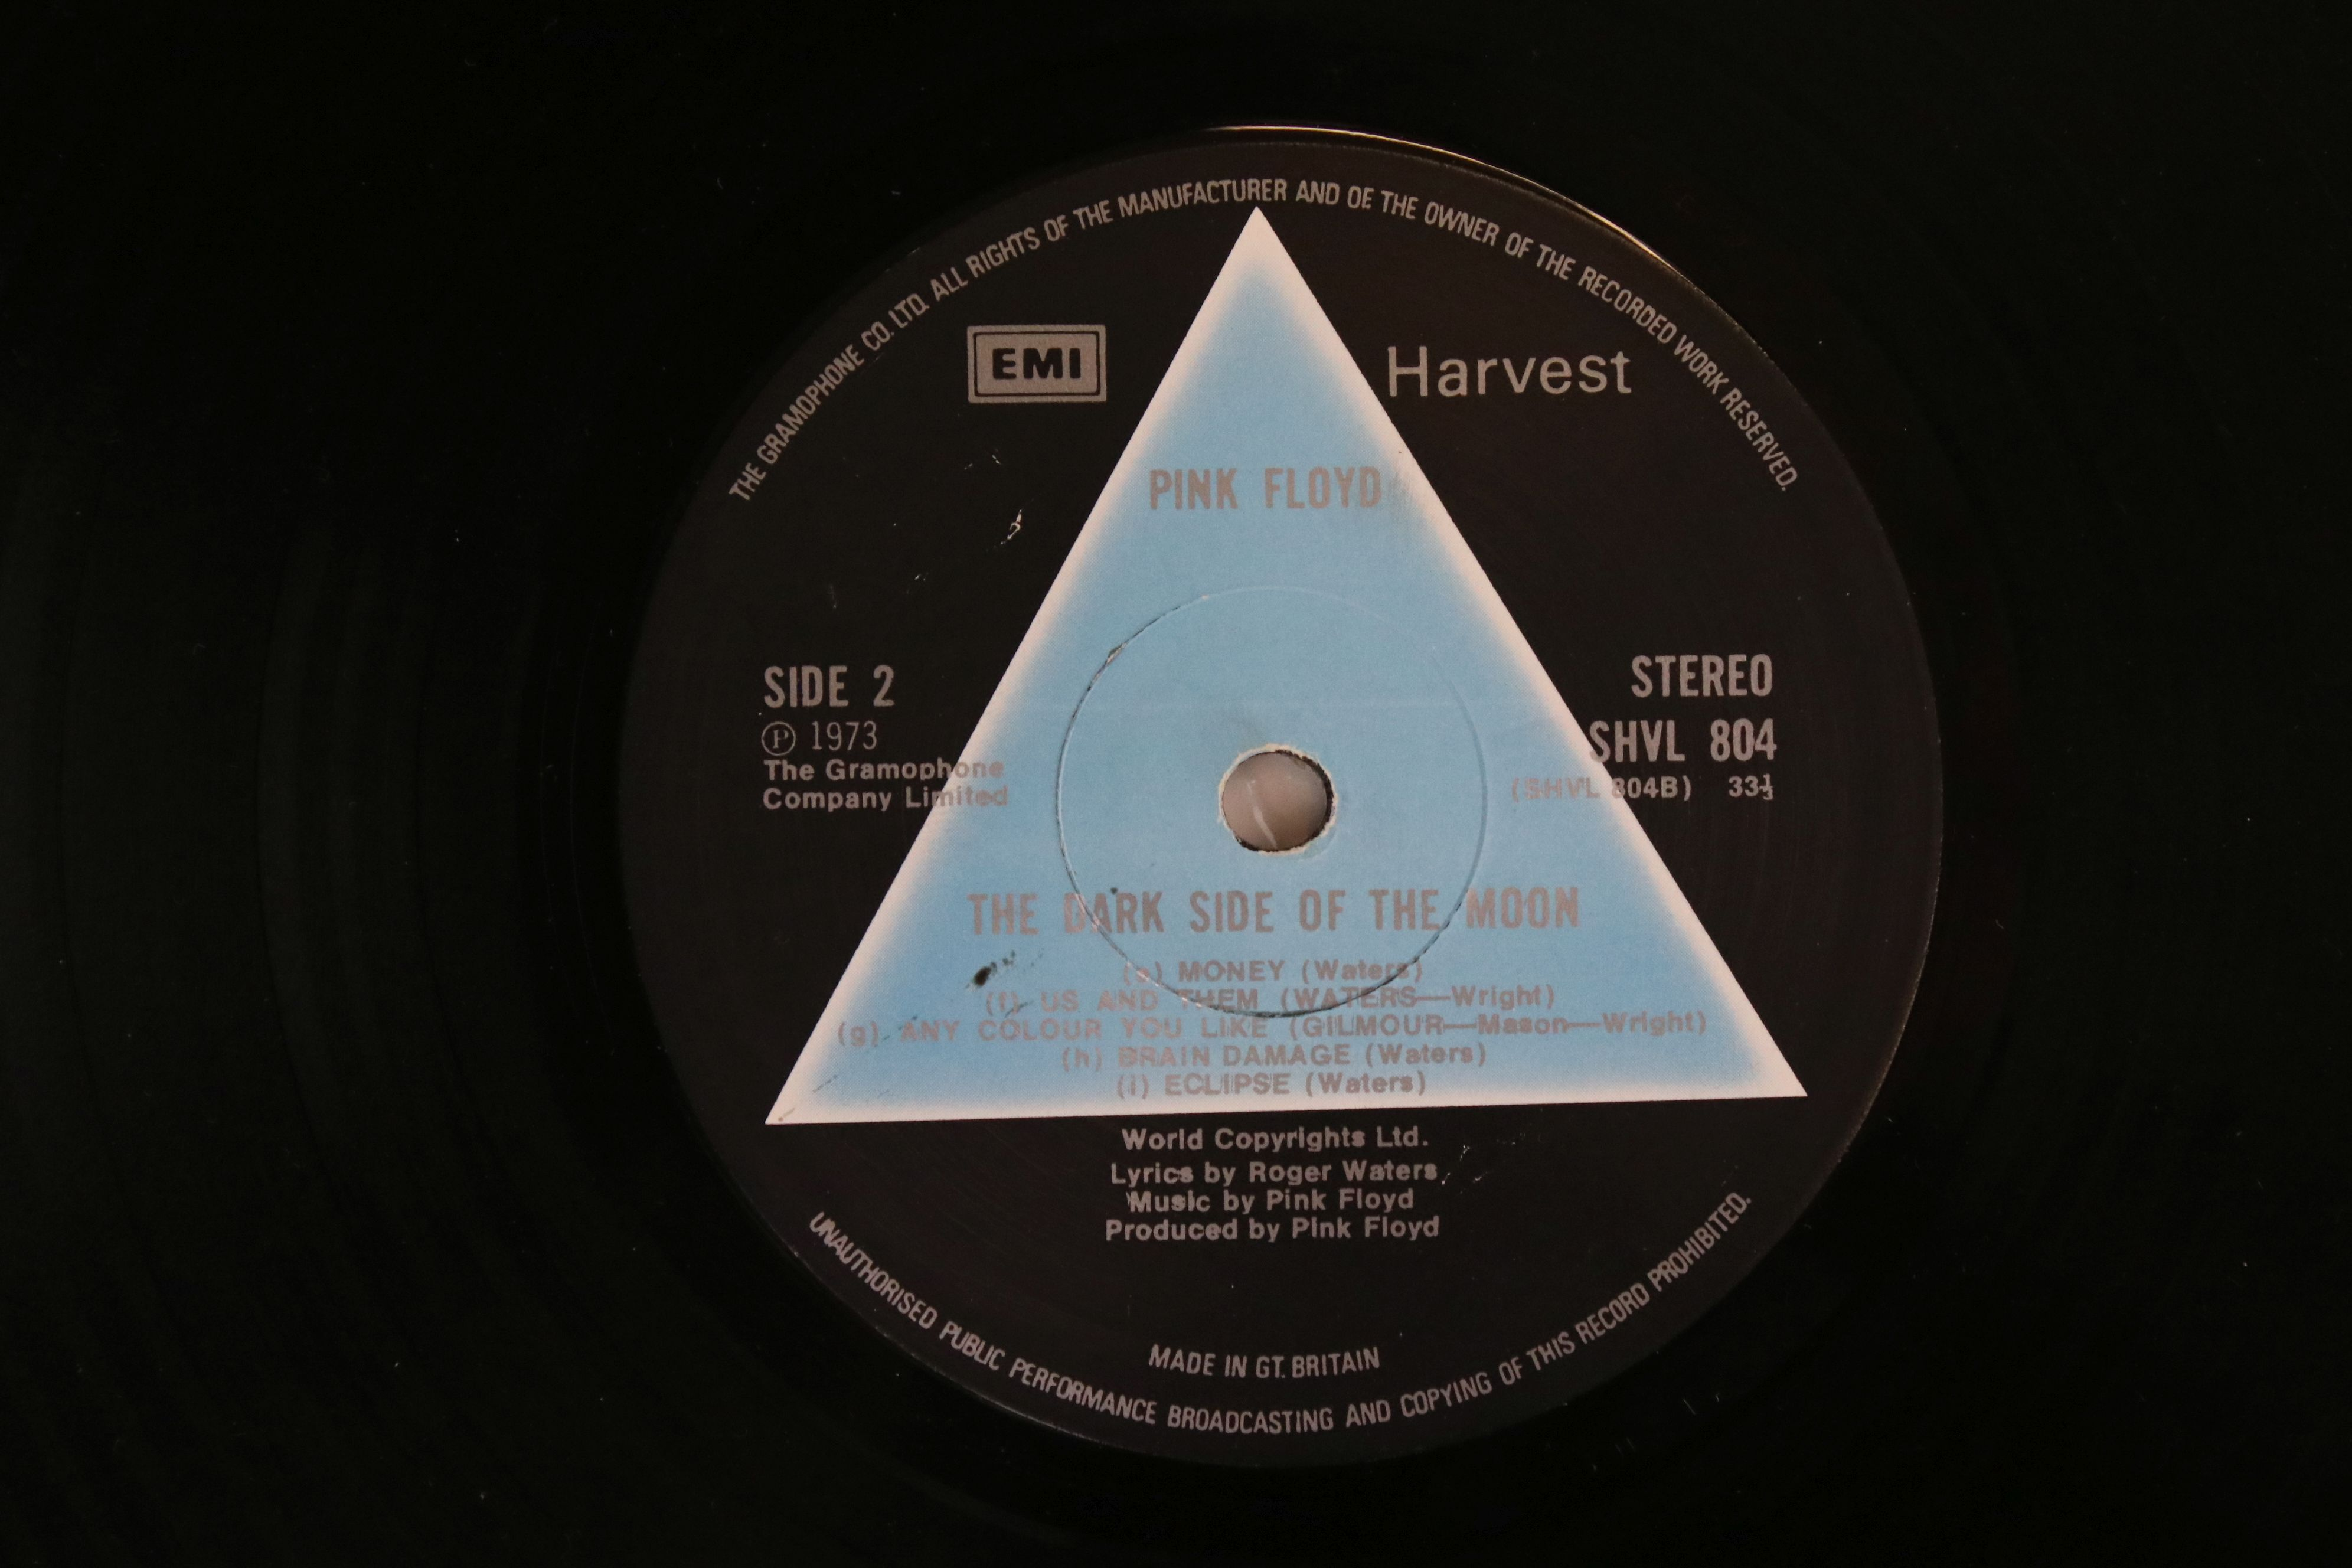 Vinyl - Pink Floyd Dark Side of The Moon LP on Harvest SHVL804 Stereo, solid light blue triangle, no - Image 3 of 6